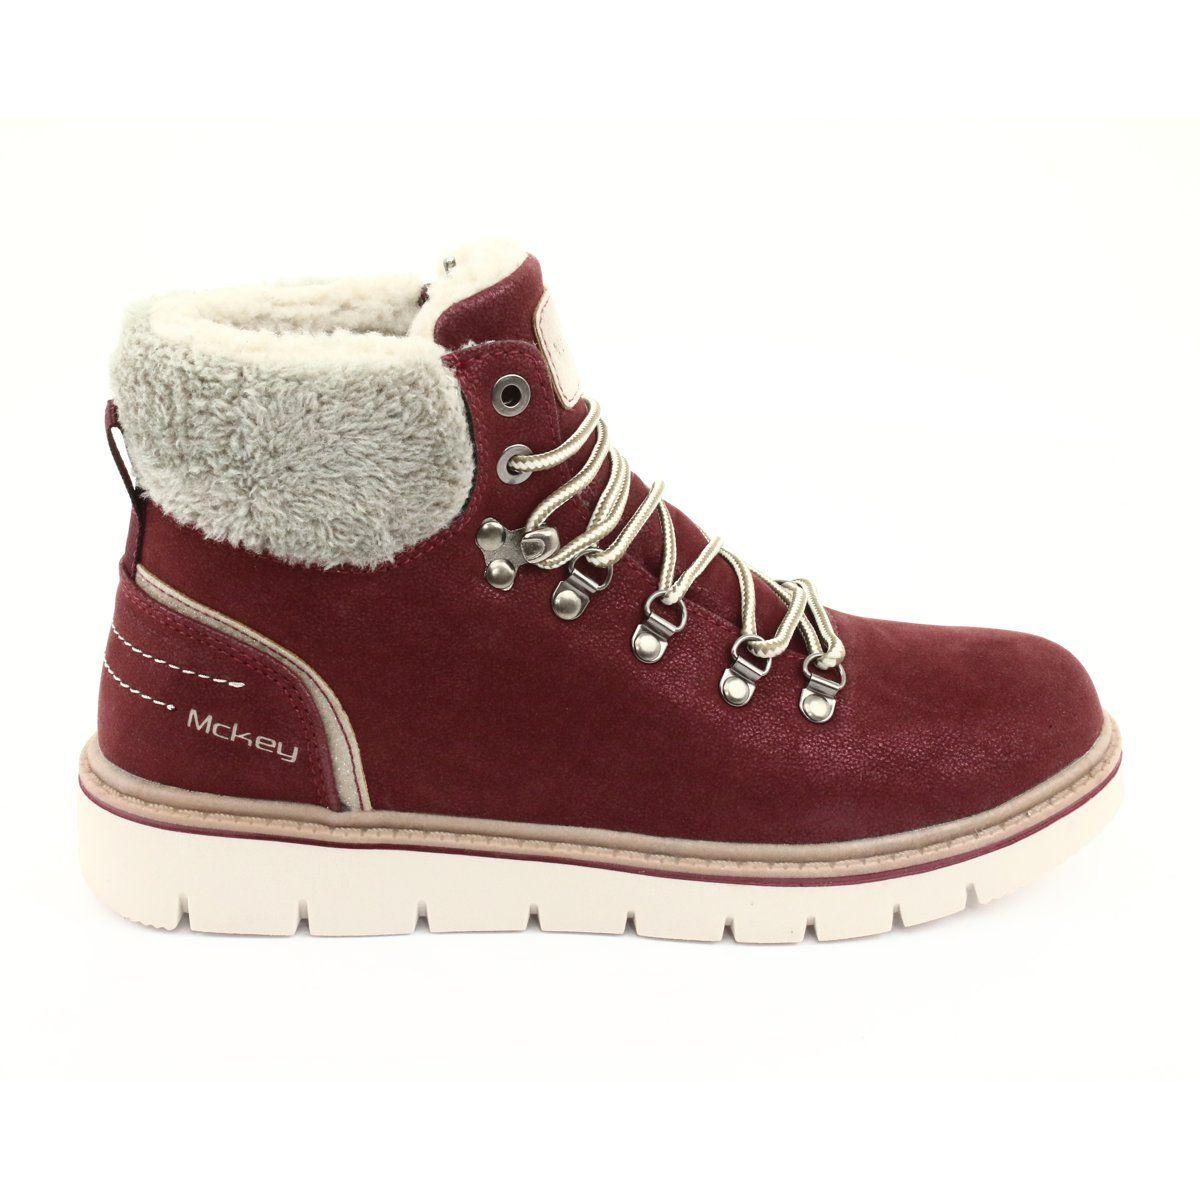 Trekking Women S Mckey Mckey 1072 Winter Lace Up Boots Winter Shoes For Women Boots Lace Up Boots